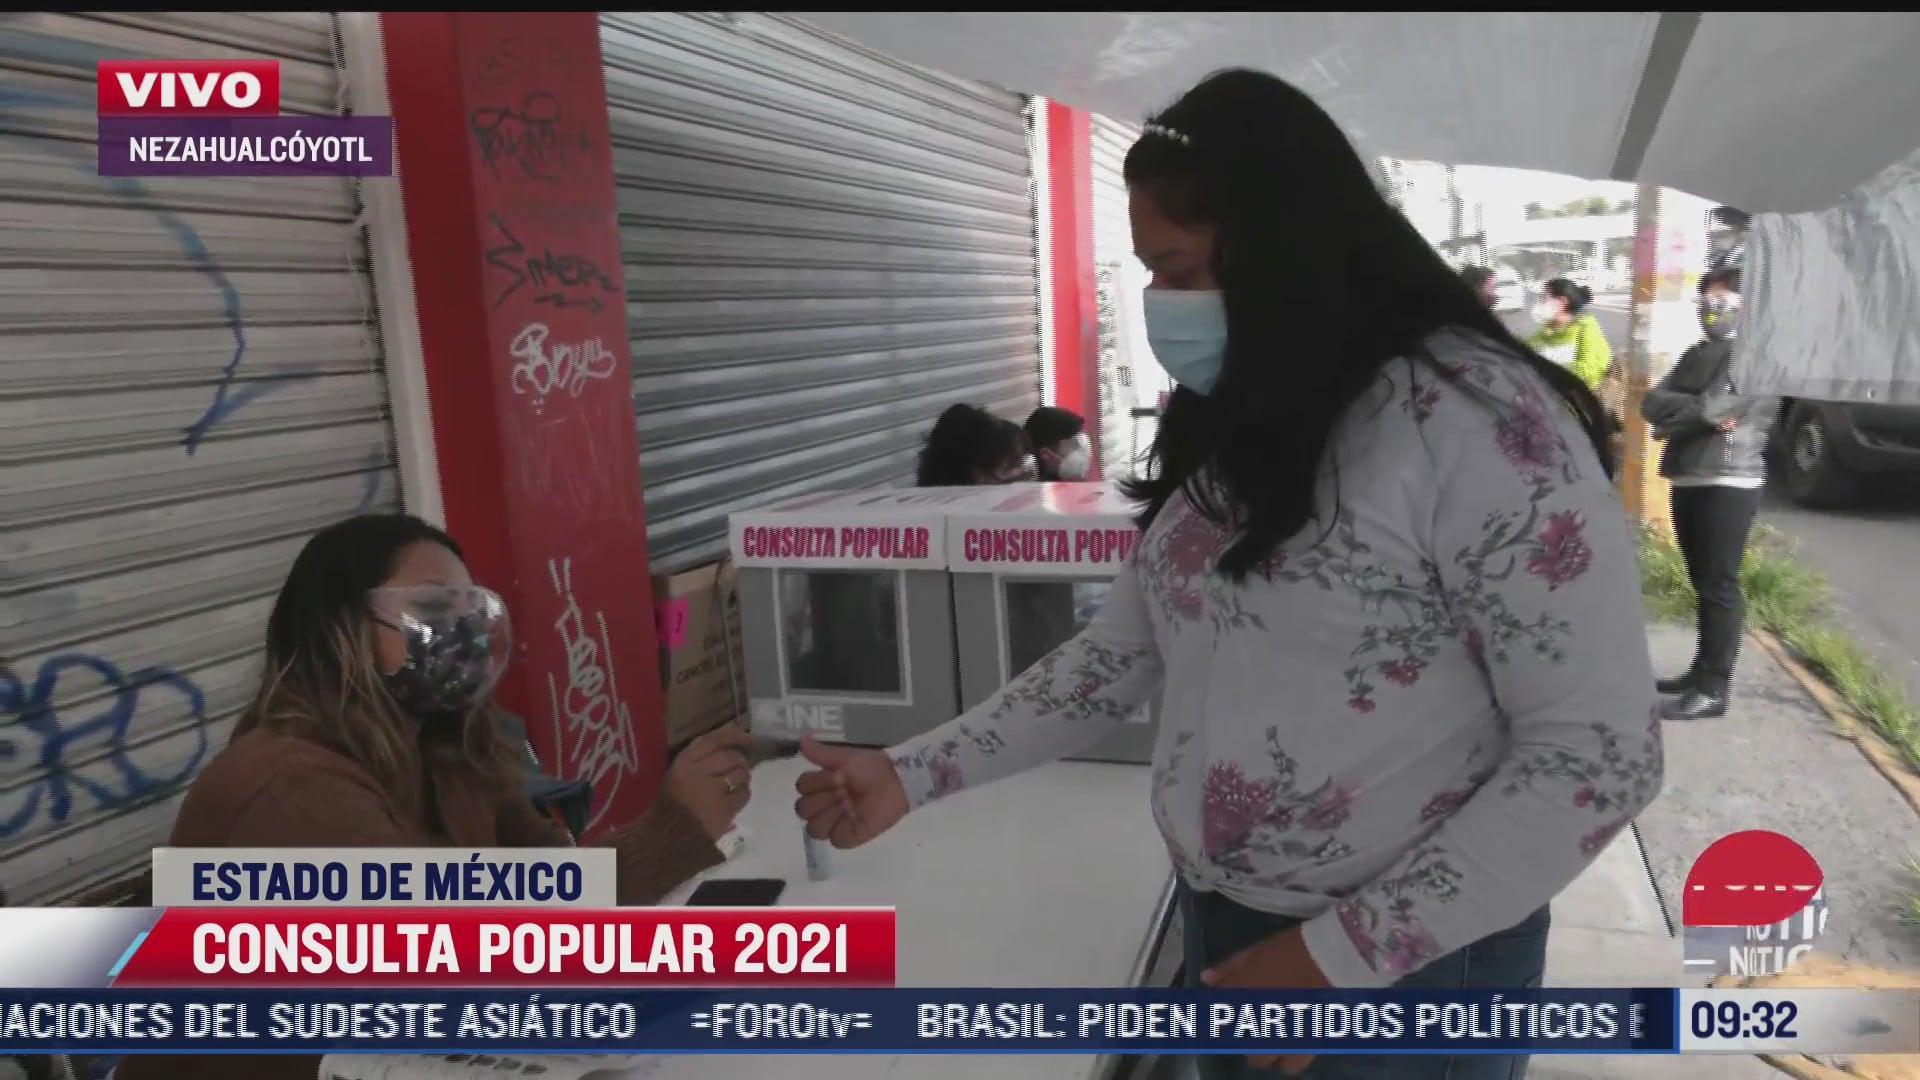 asi transcurre la consulta popular 2021 en nezahualcoyotl